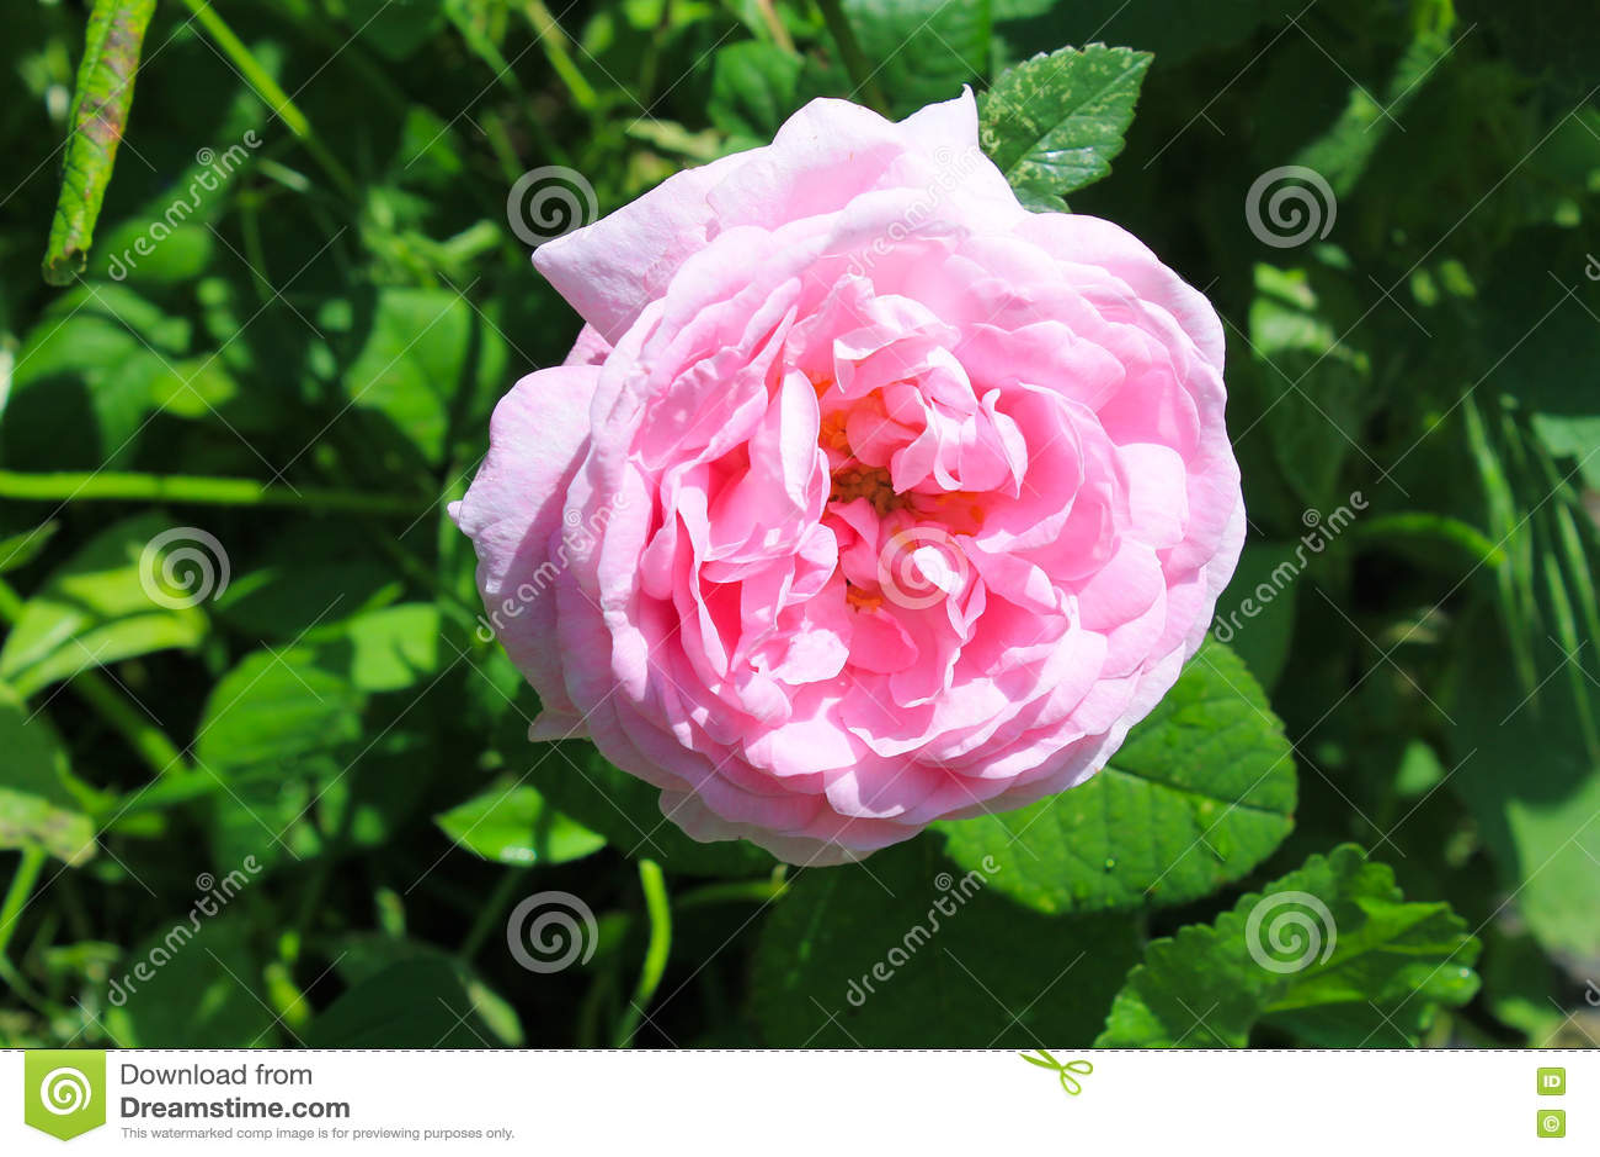 Wild pinkrose